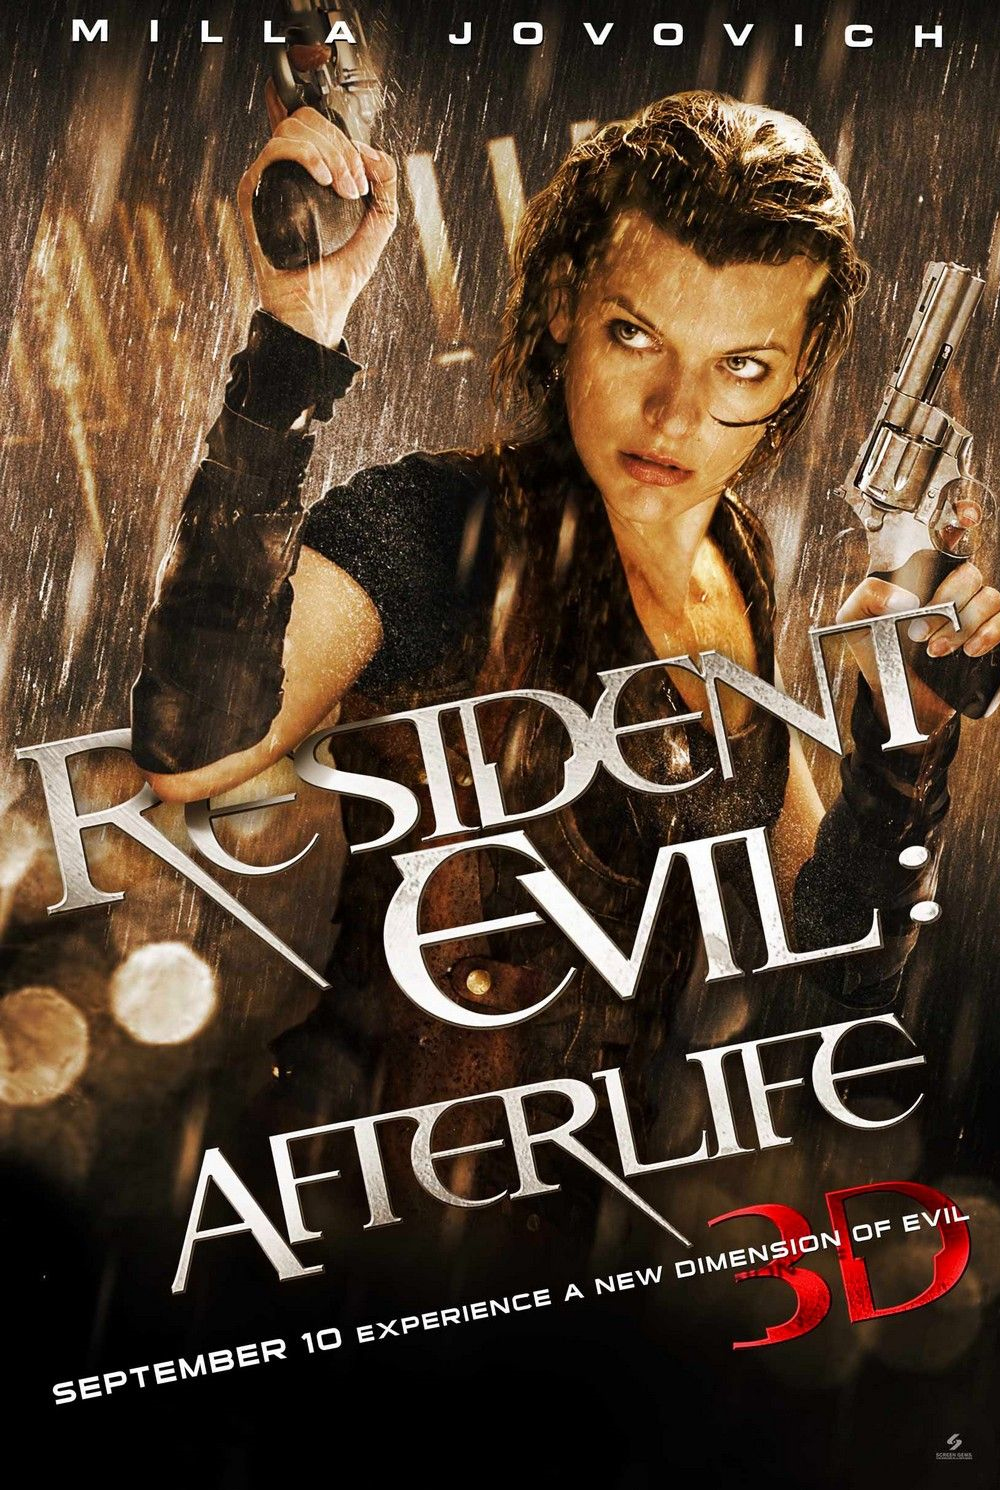 Resident Evil: Afterlife (2010)   CINEMATIC SHOCKS IS HERE!